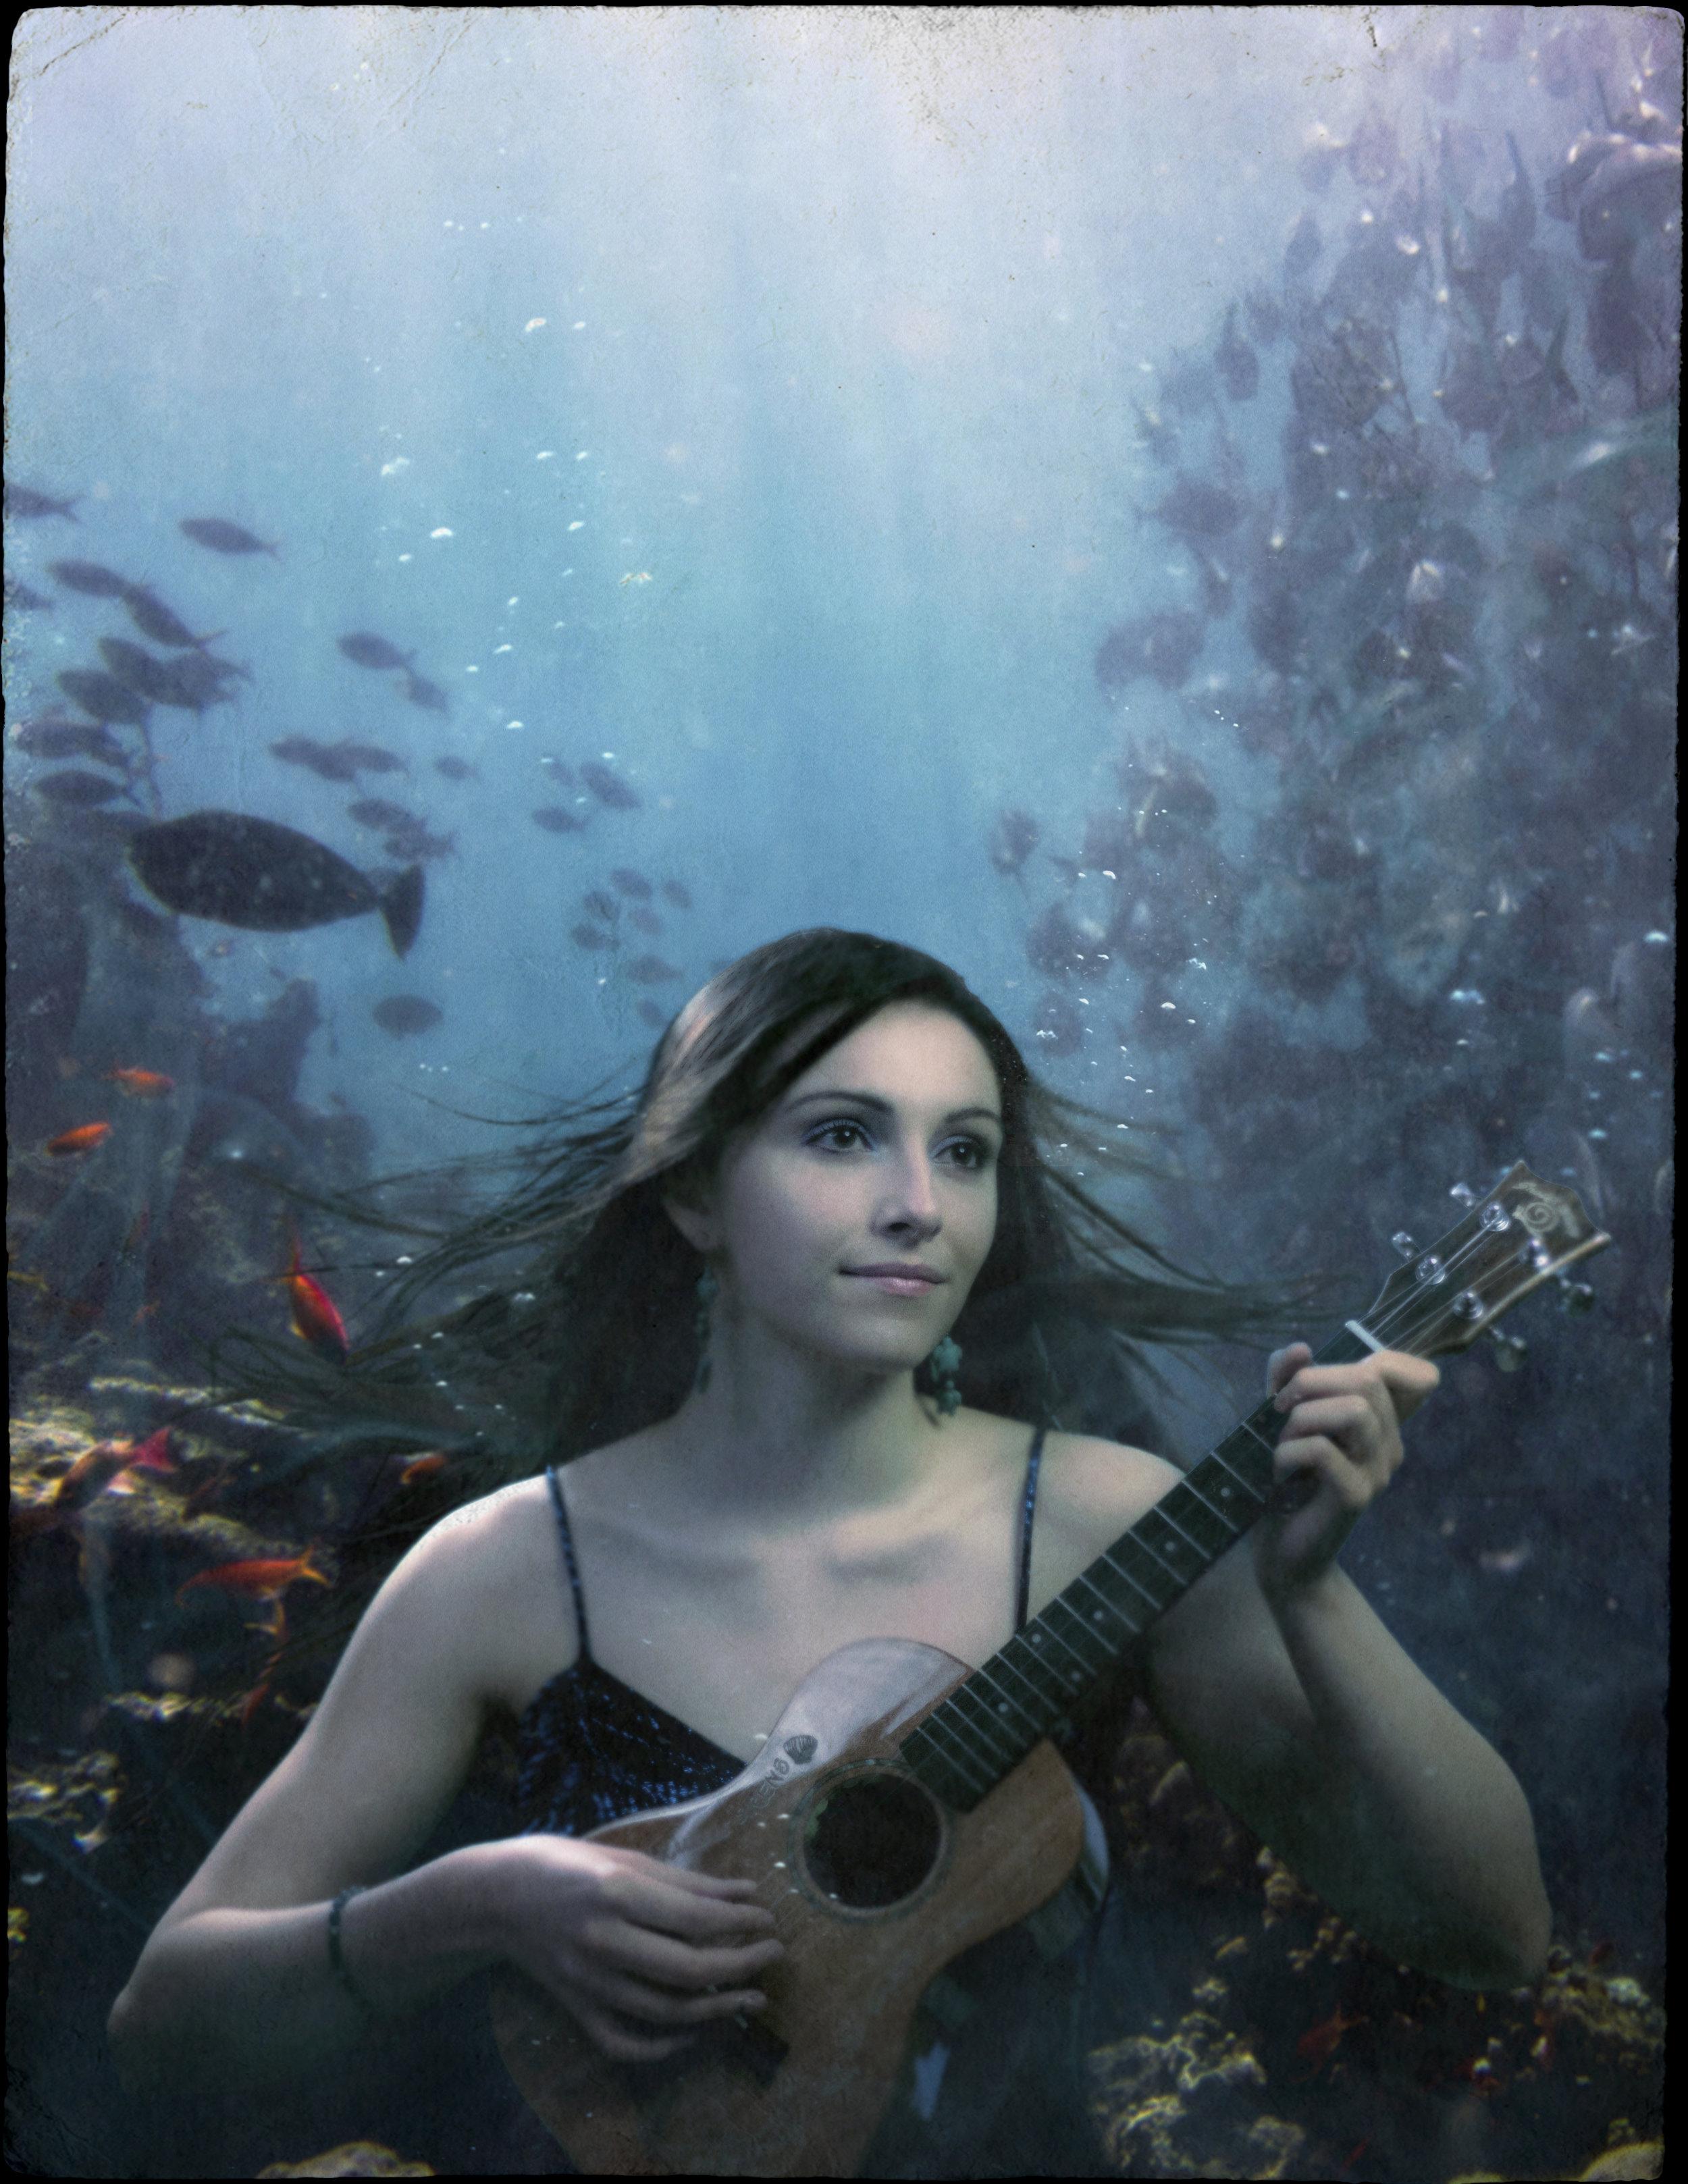 Maiah Wynne Uke Sirens Promotional Graphic